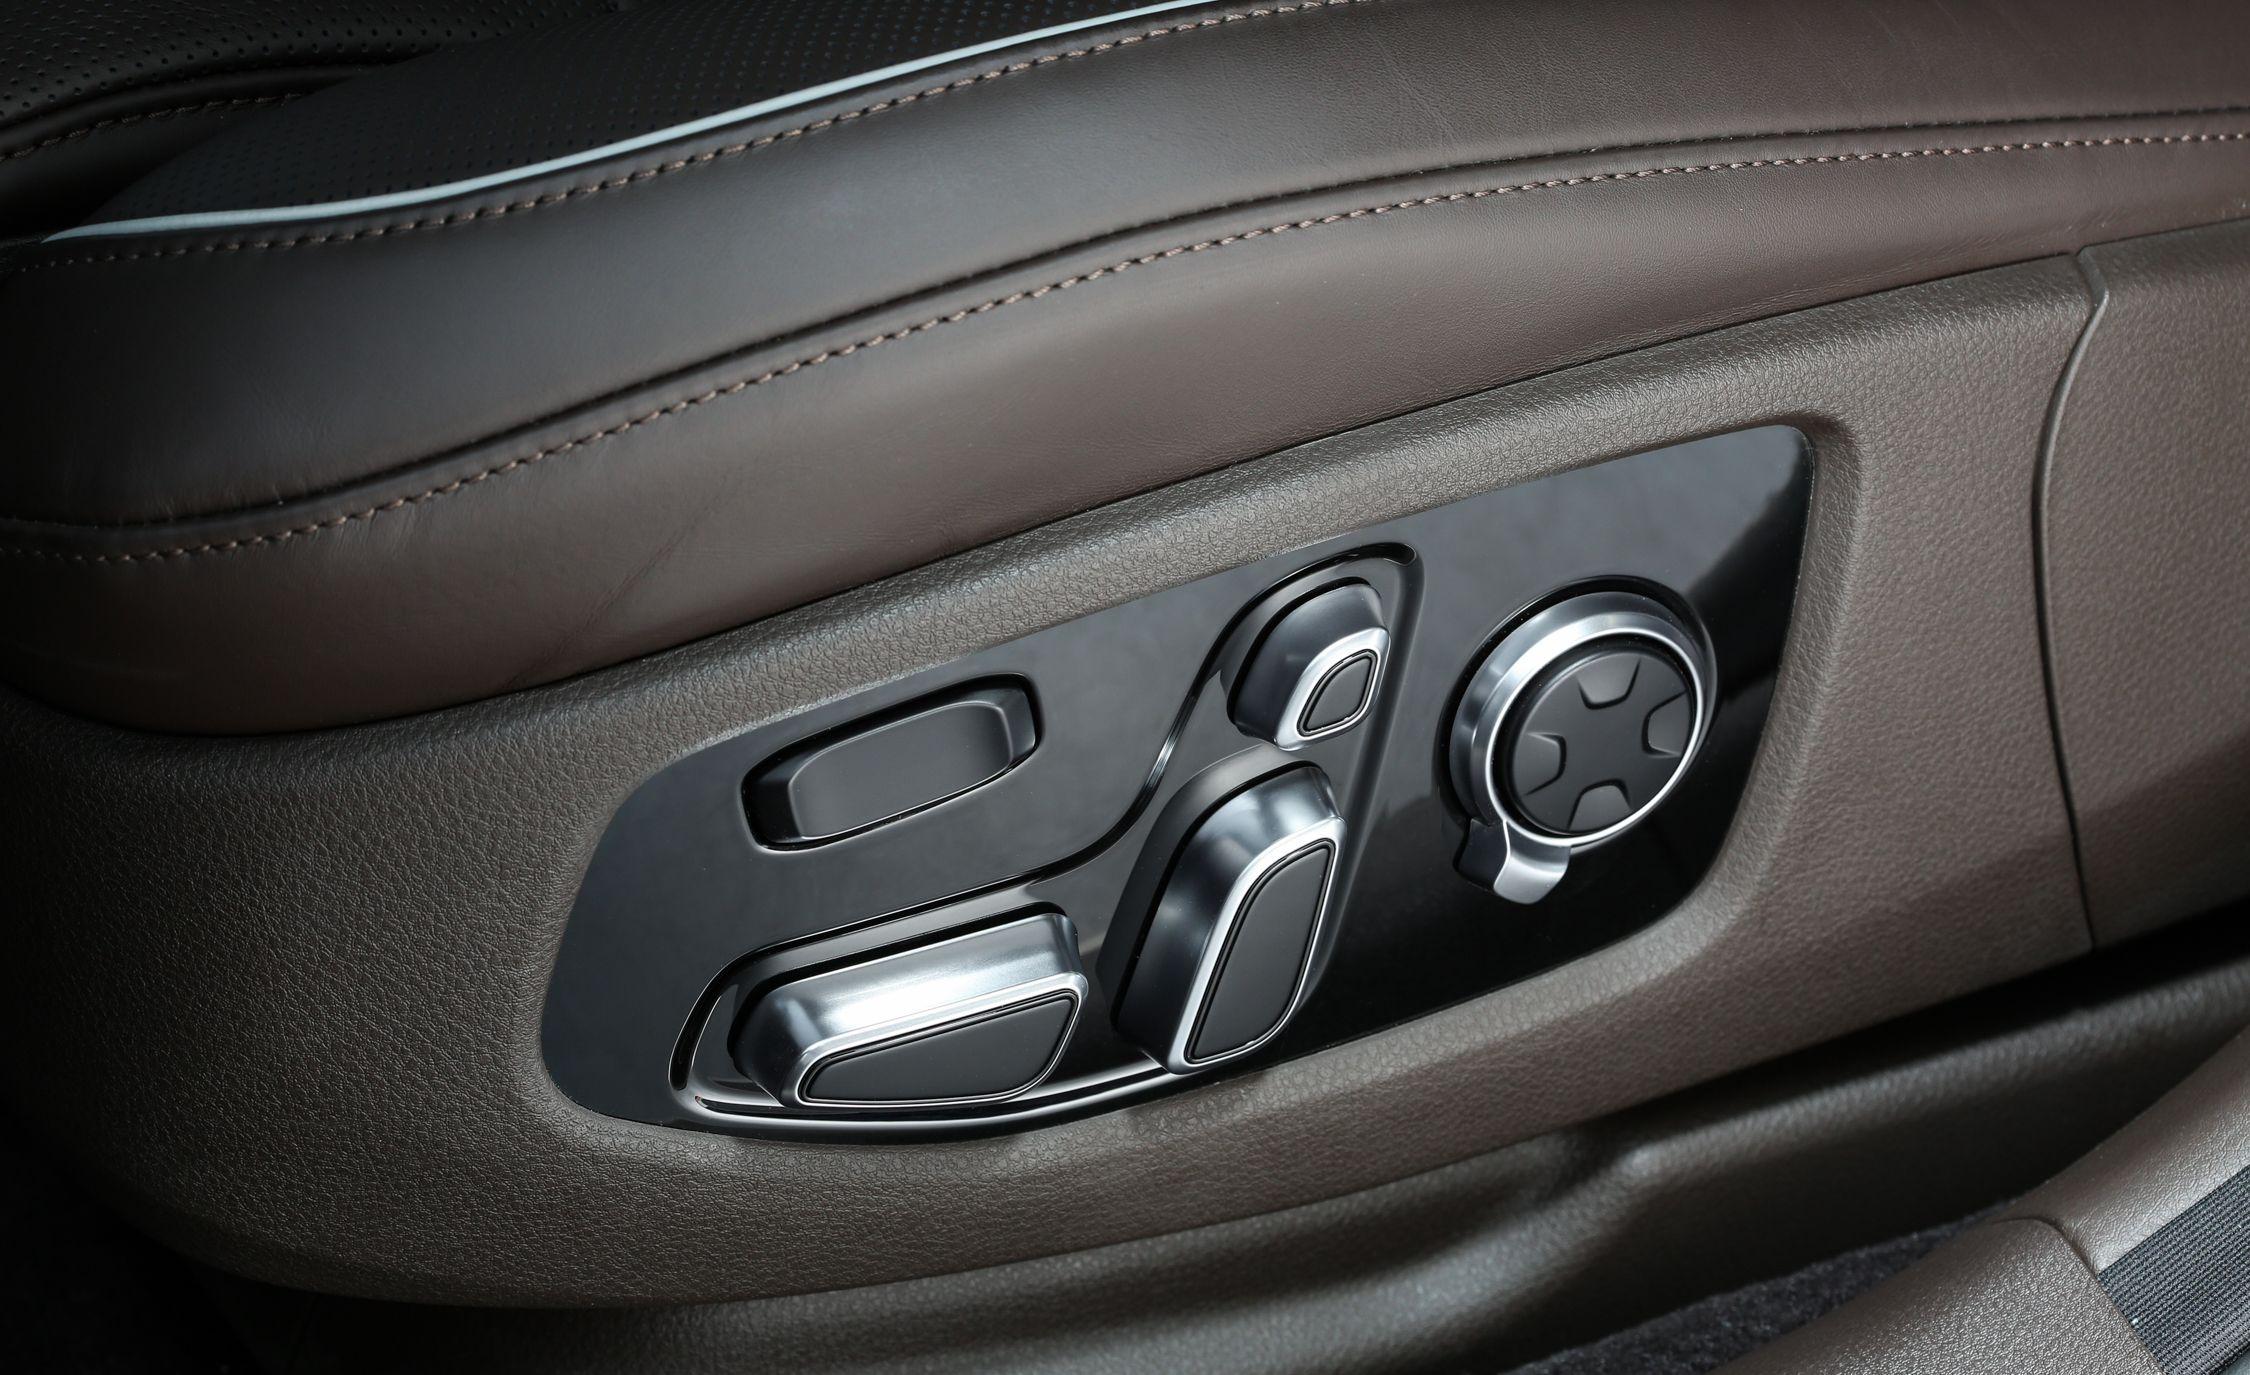 2019 Kia K900 Reviews Kia K900 Price Photos And Specs Car And